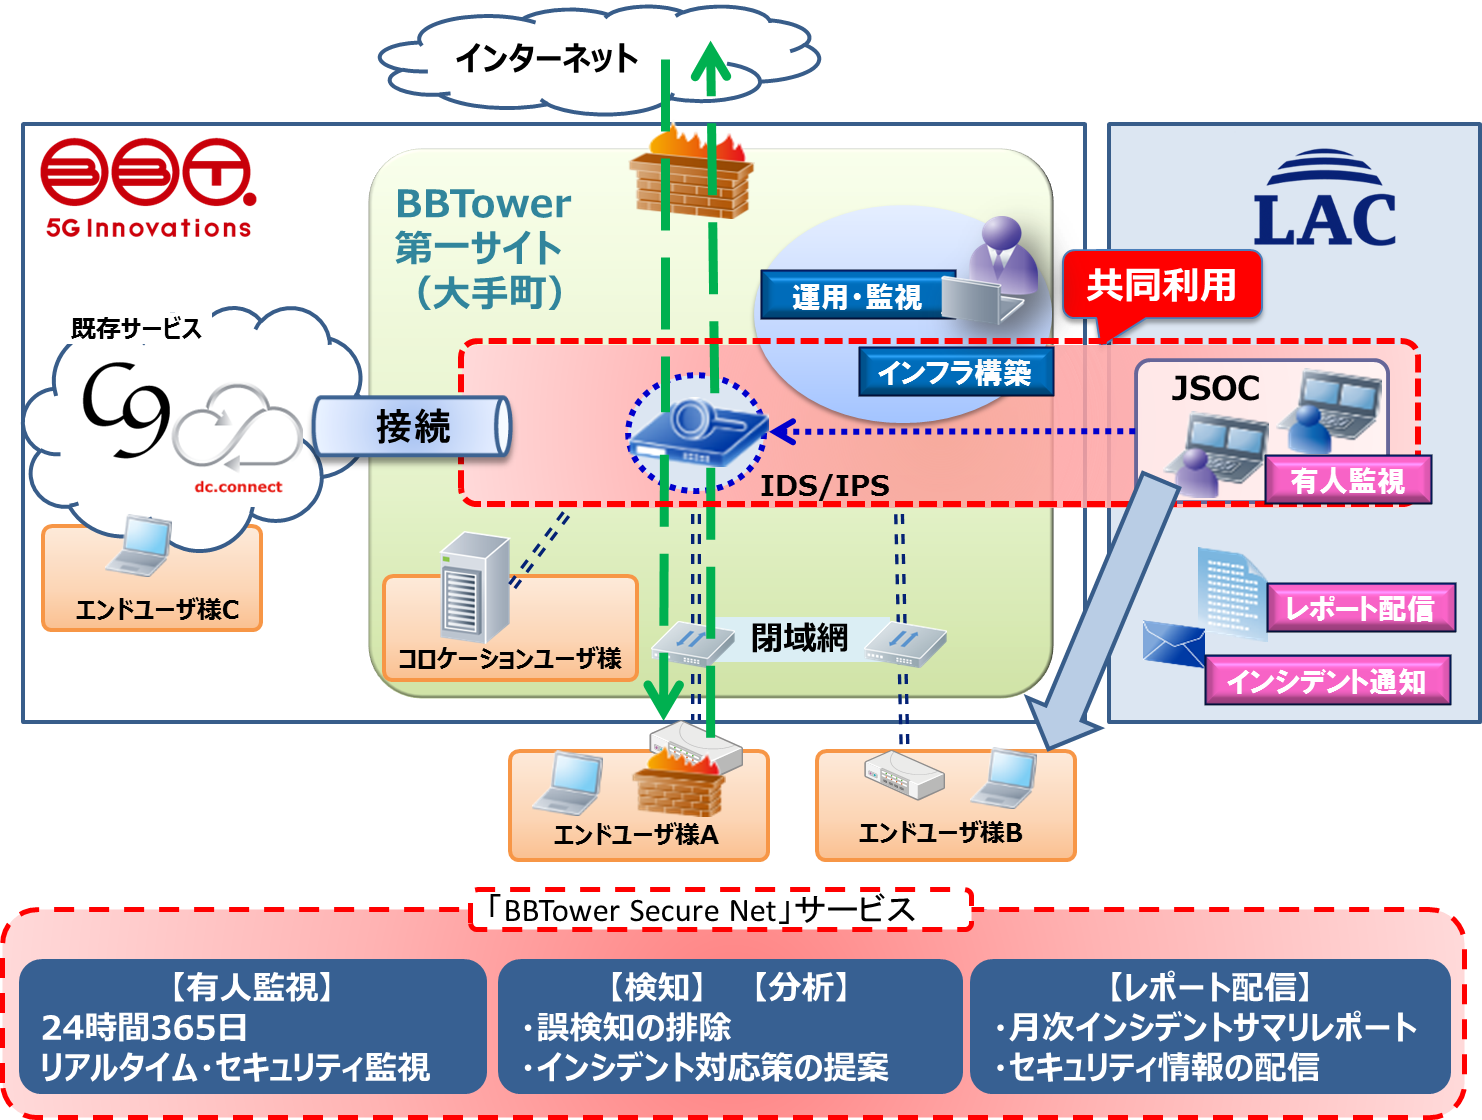 bbtower_secure_net_service.png